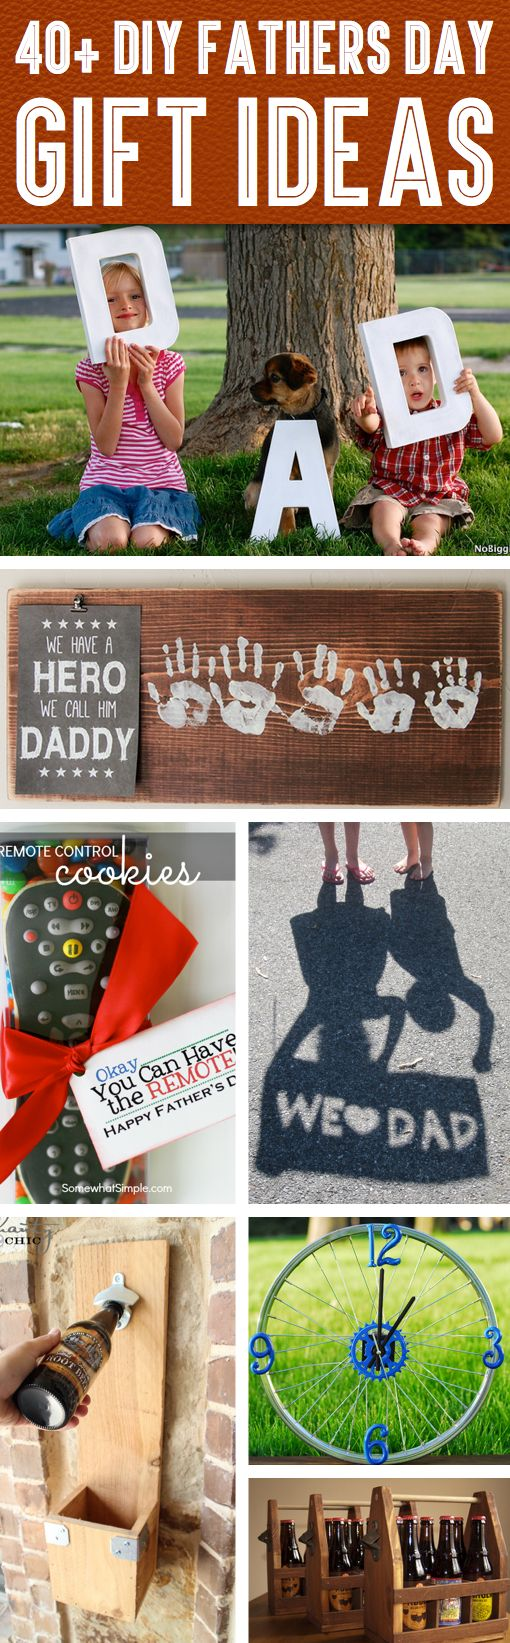 Diy christmas gift ideas dad